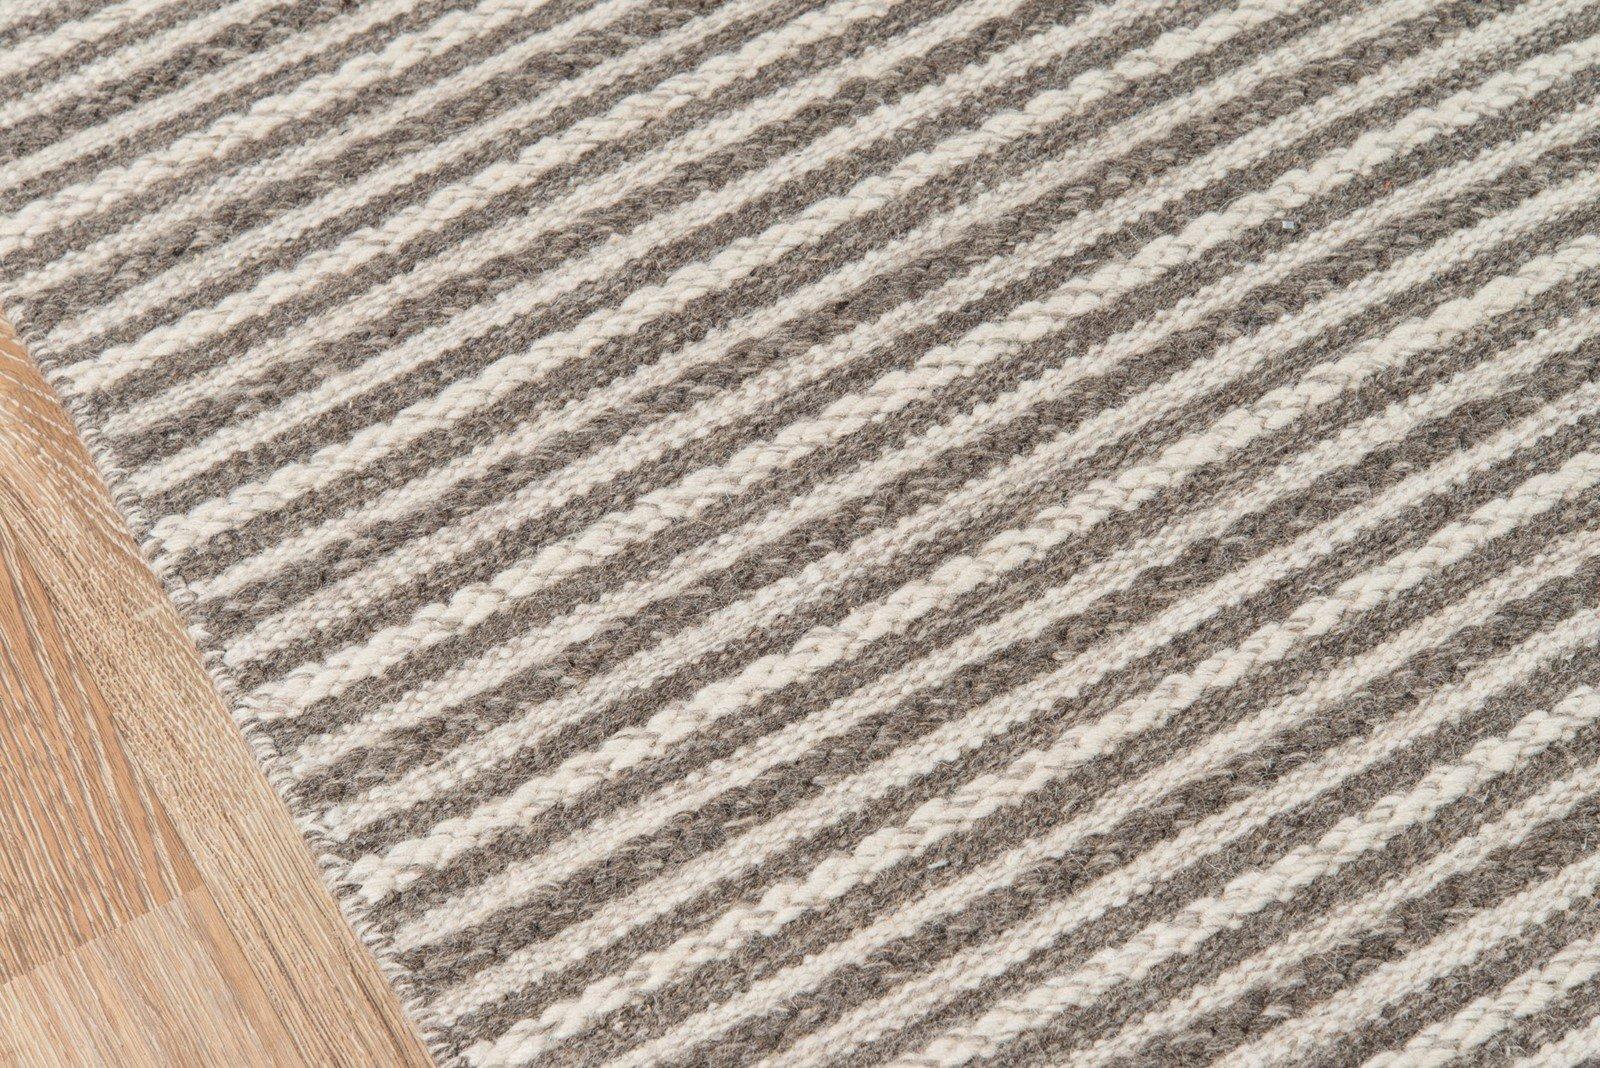 Momeni Rugs MESA0MES-3NAT5080 Mesa Collection, 100% Wool Hand Woven Flatweave Transitional Area Rug, 5' x 8', Natural Brown by Momeni Rugs (Image #3)